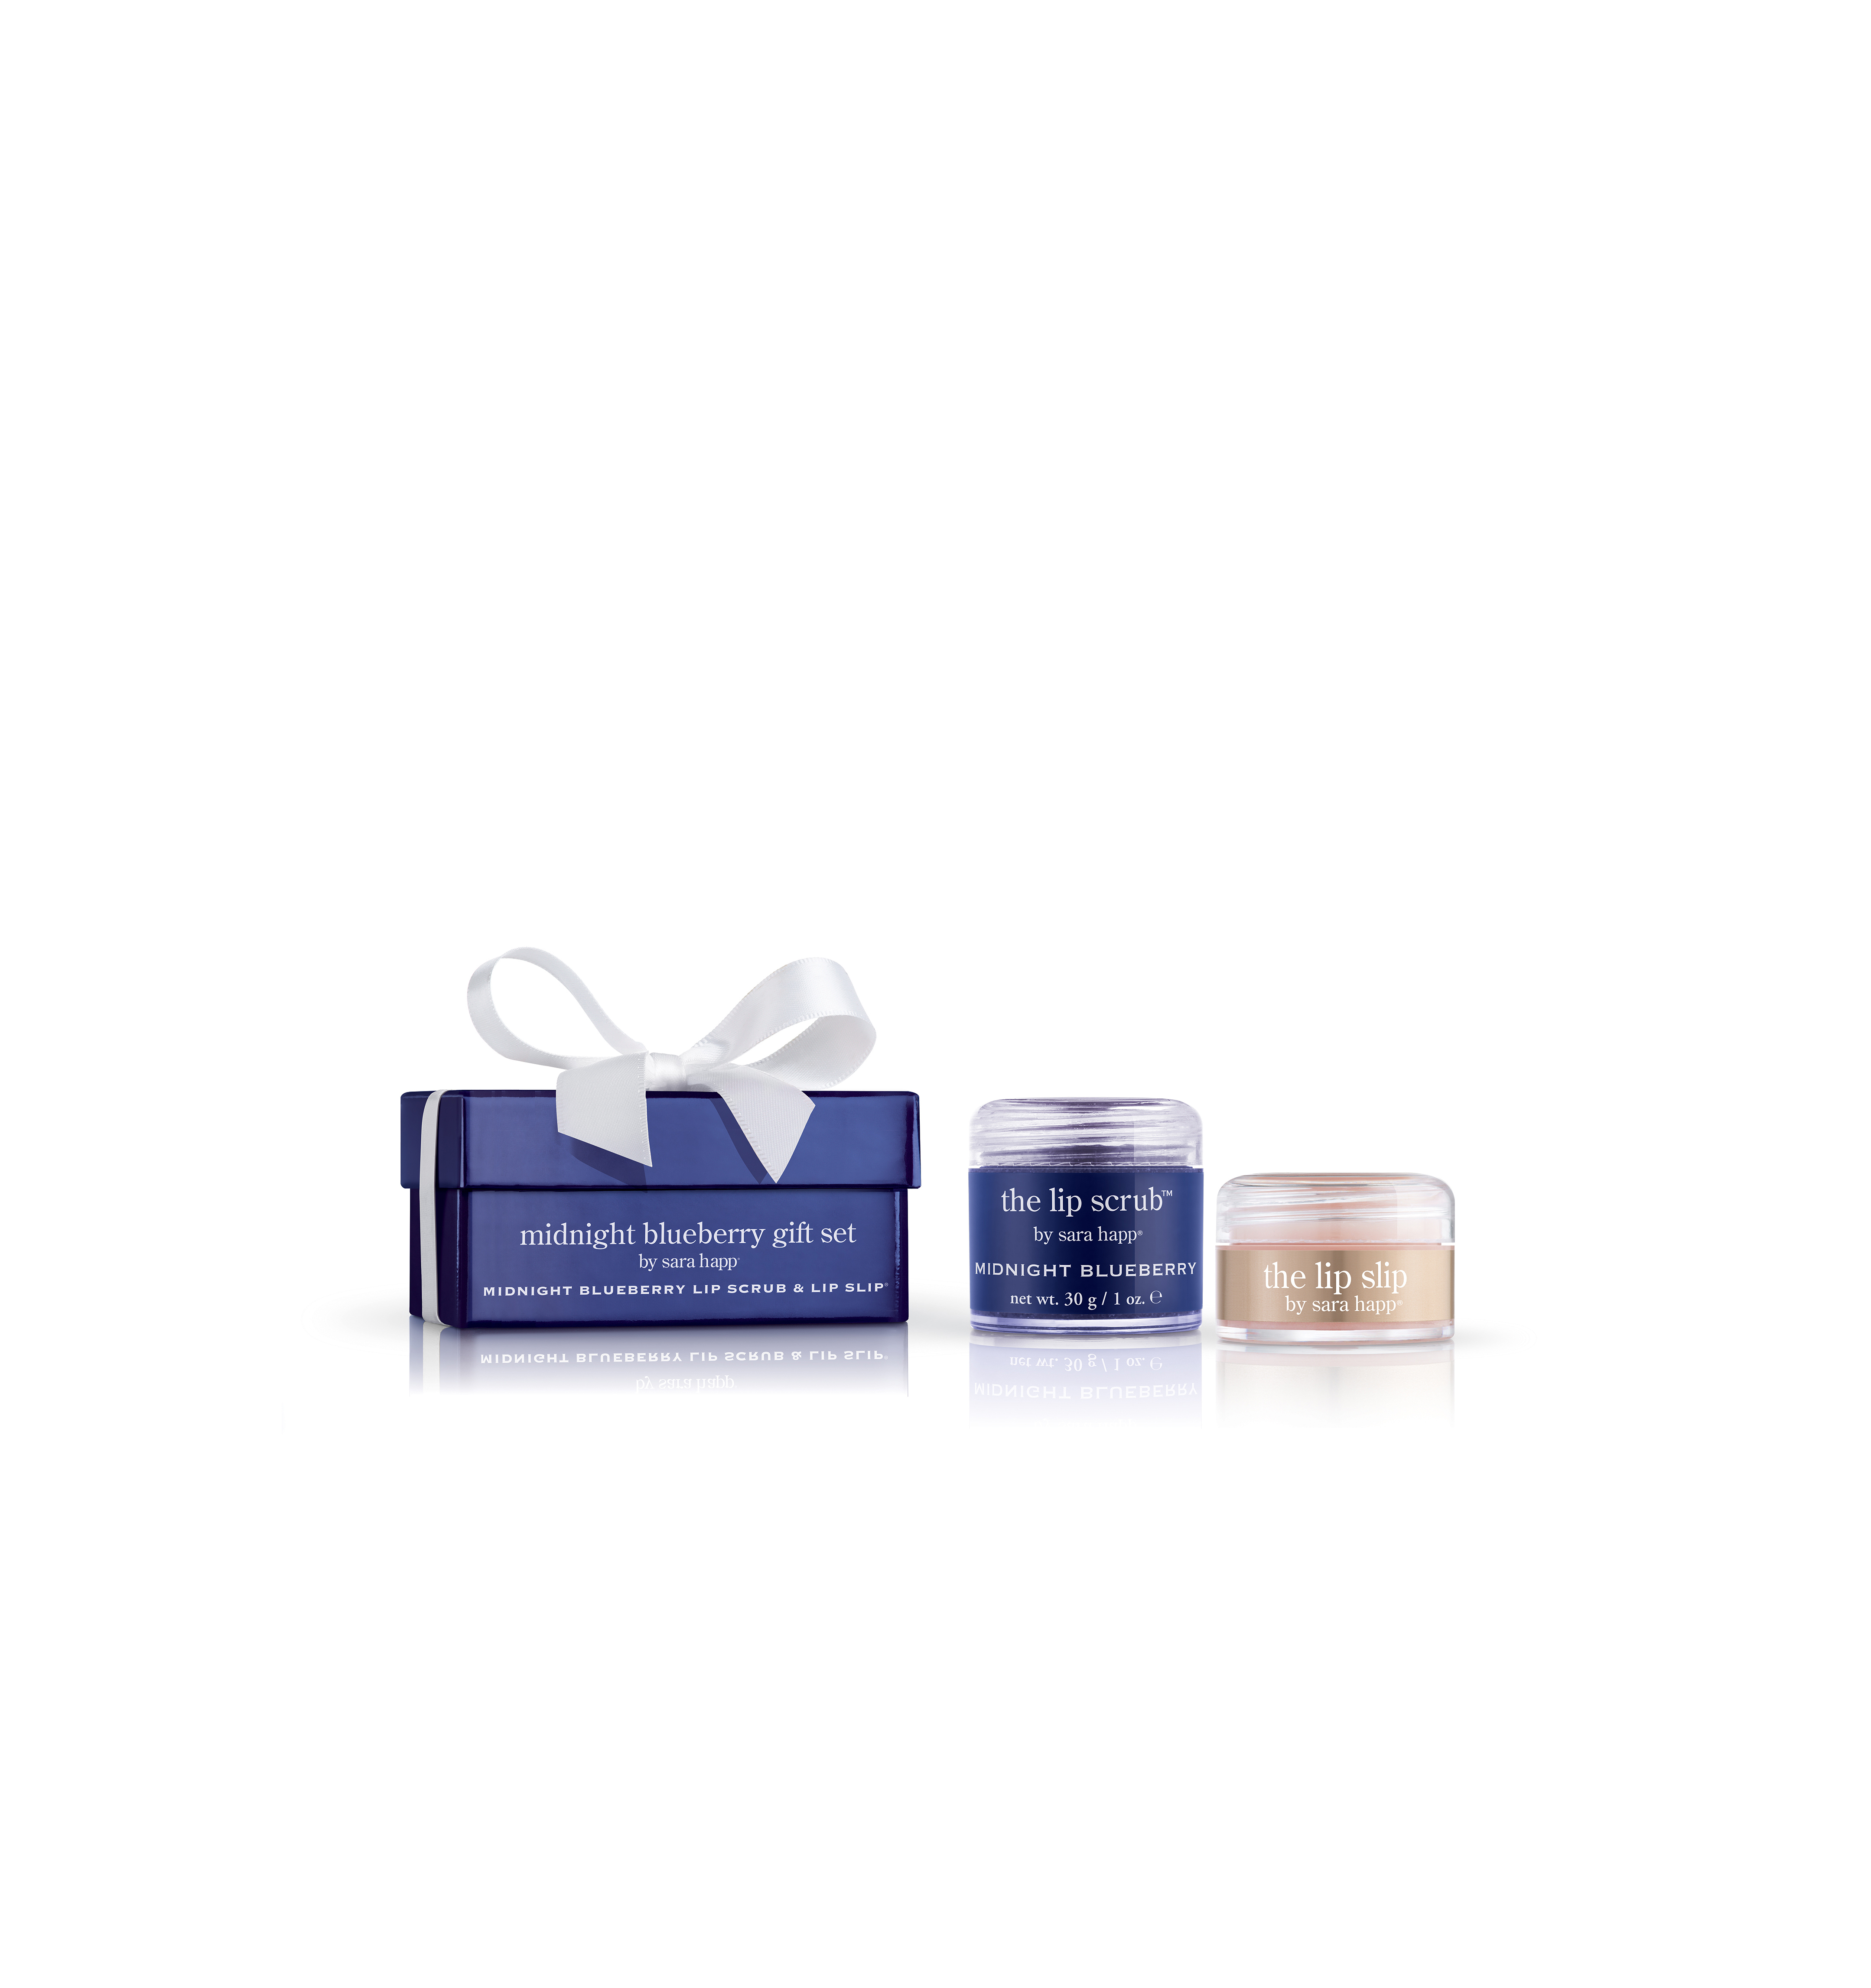 sara-happ-midnight-blueberry-gift-0916